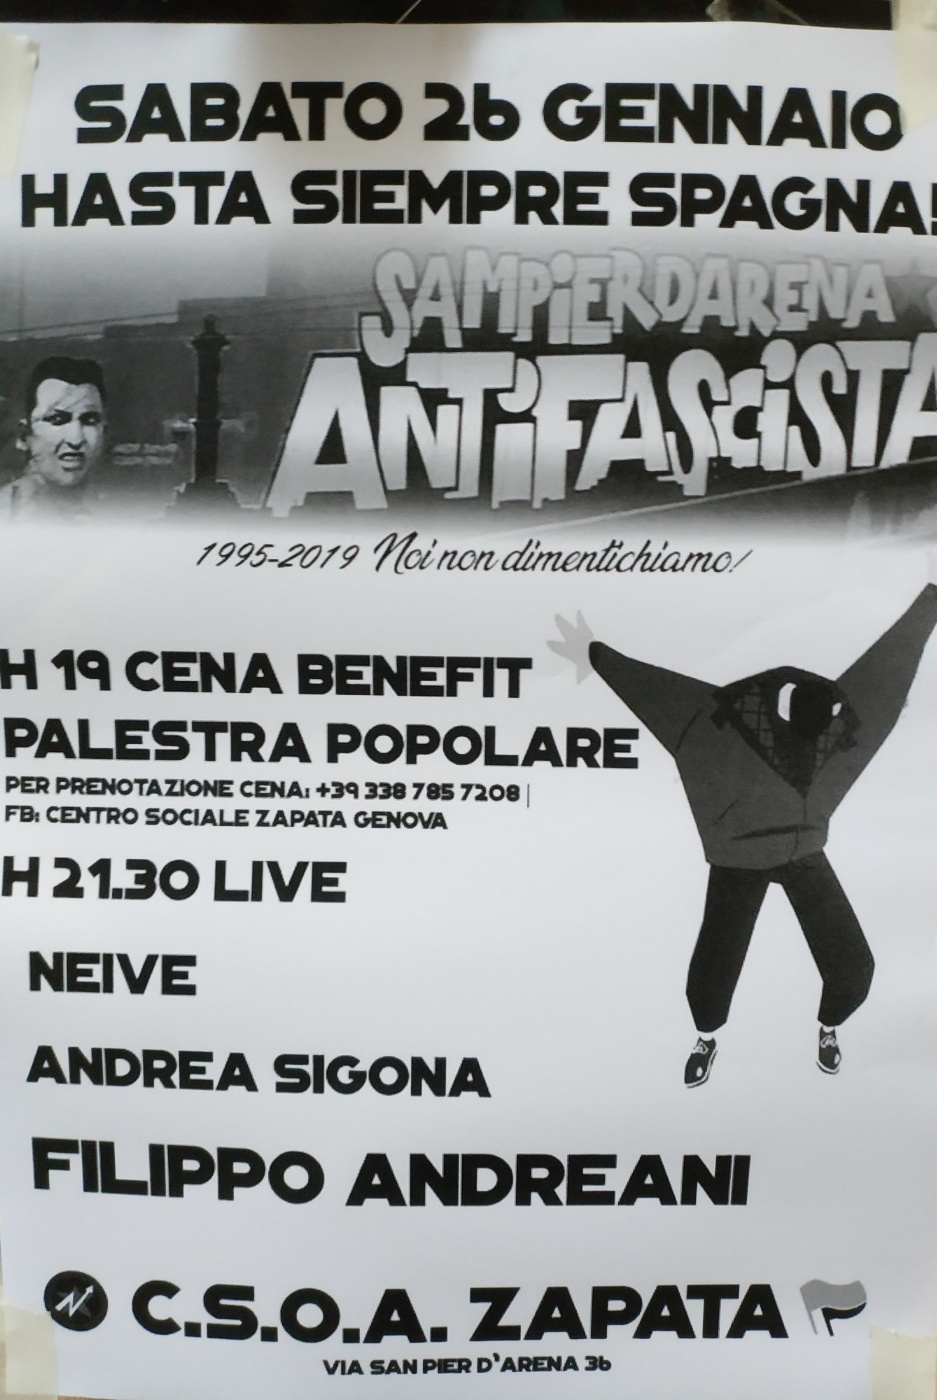 CSOA Zapata Via San Pier d'Arena 36, 16151 Genova Dal 26/01/2019 Al 26/01/2019 19:00 - 02:00